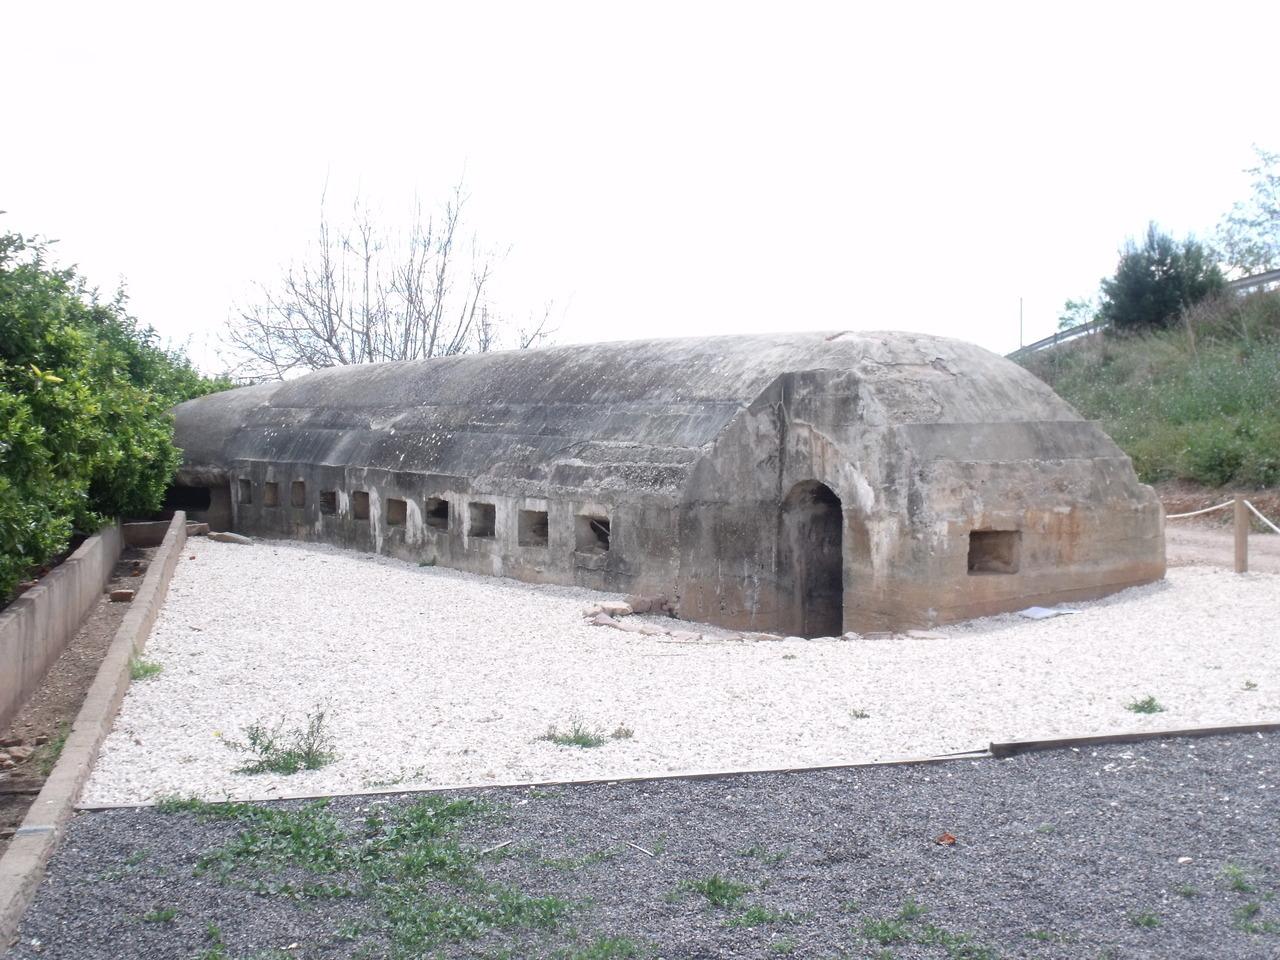 Civil war era bunker, Nules, – Abandoned Playgrounds